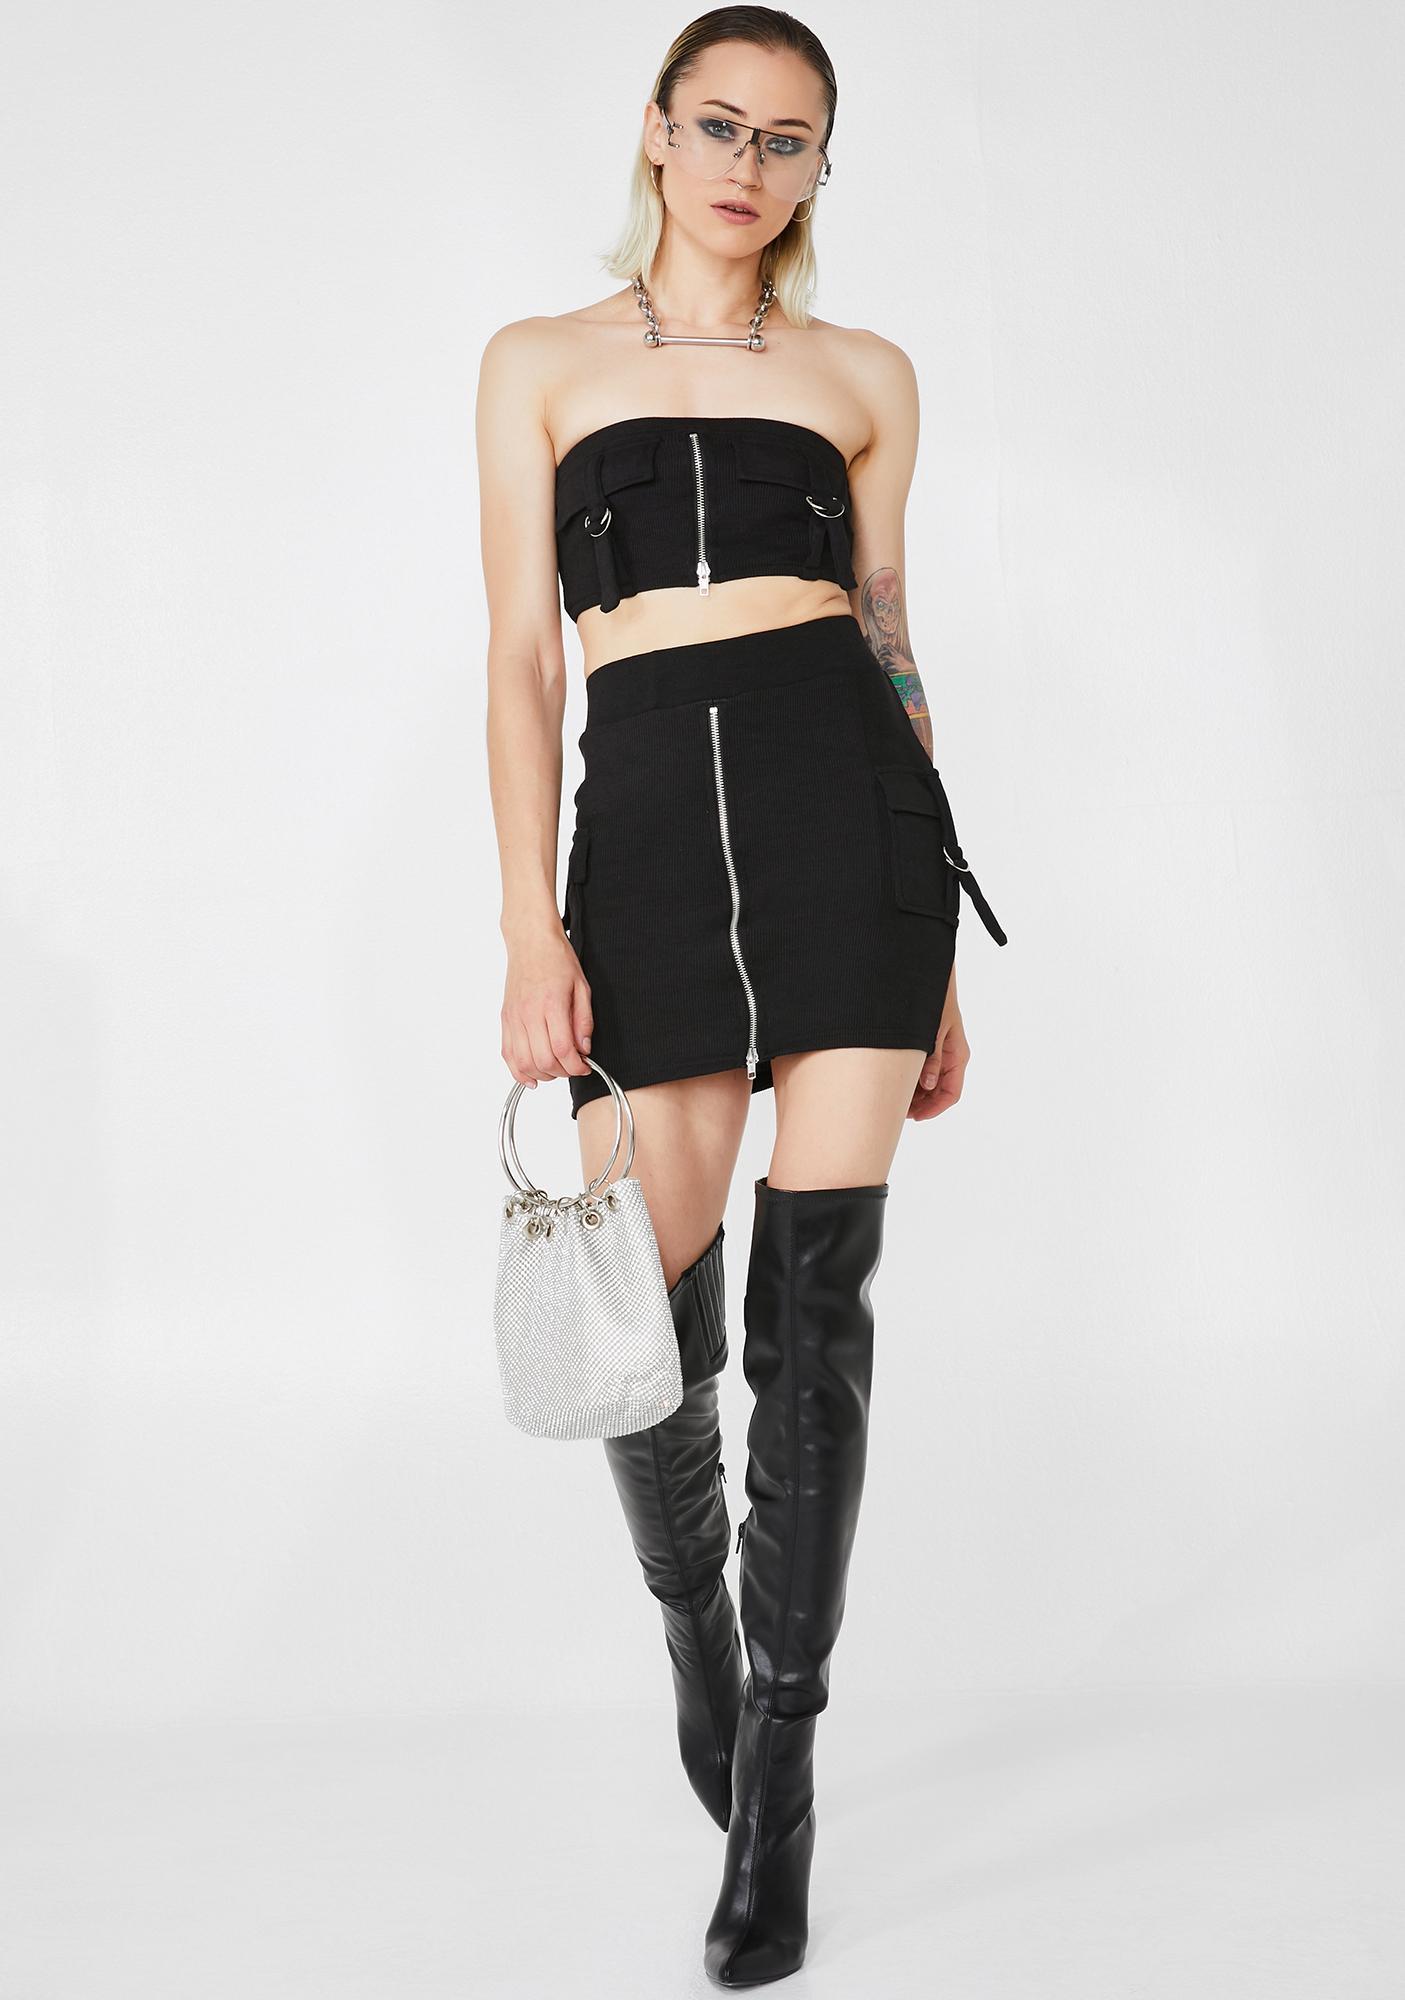 Rough Ryder Skirt Set